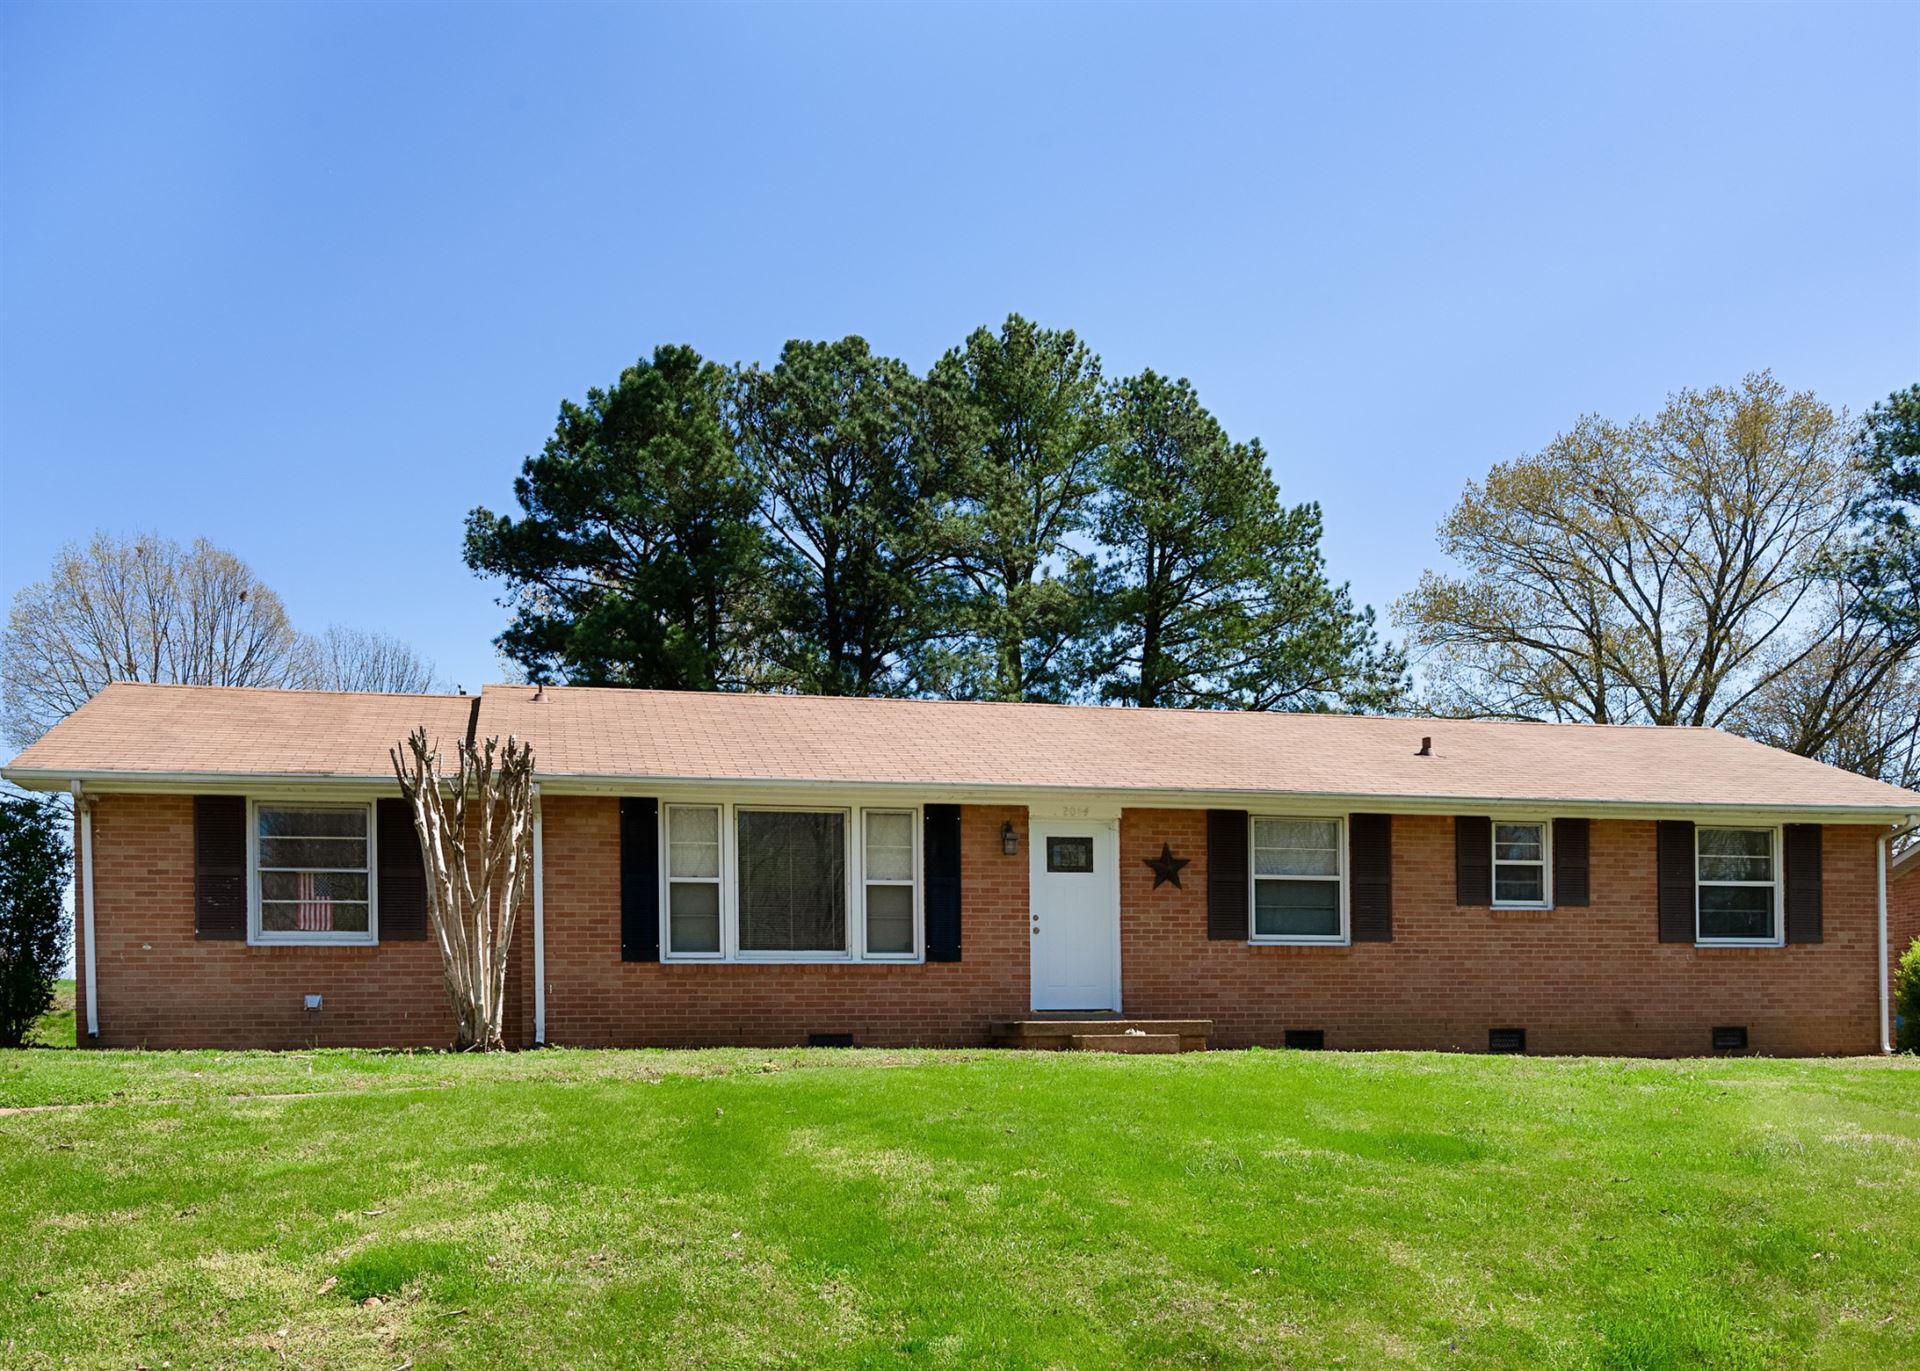 2084 Landon Rd, Clarksville, TN 37043 - MLS#: 2241687